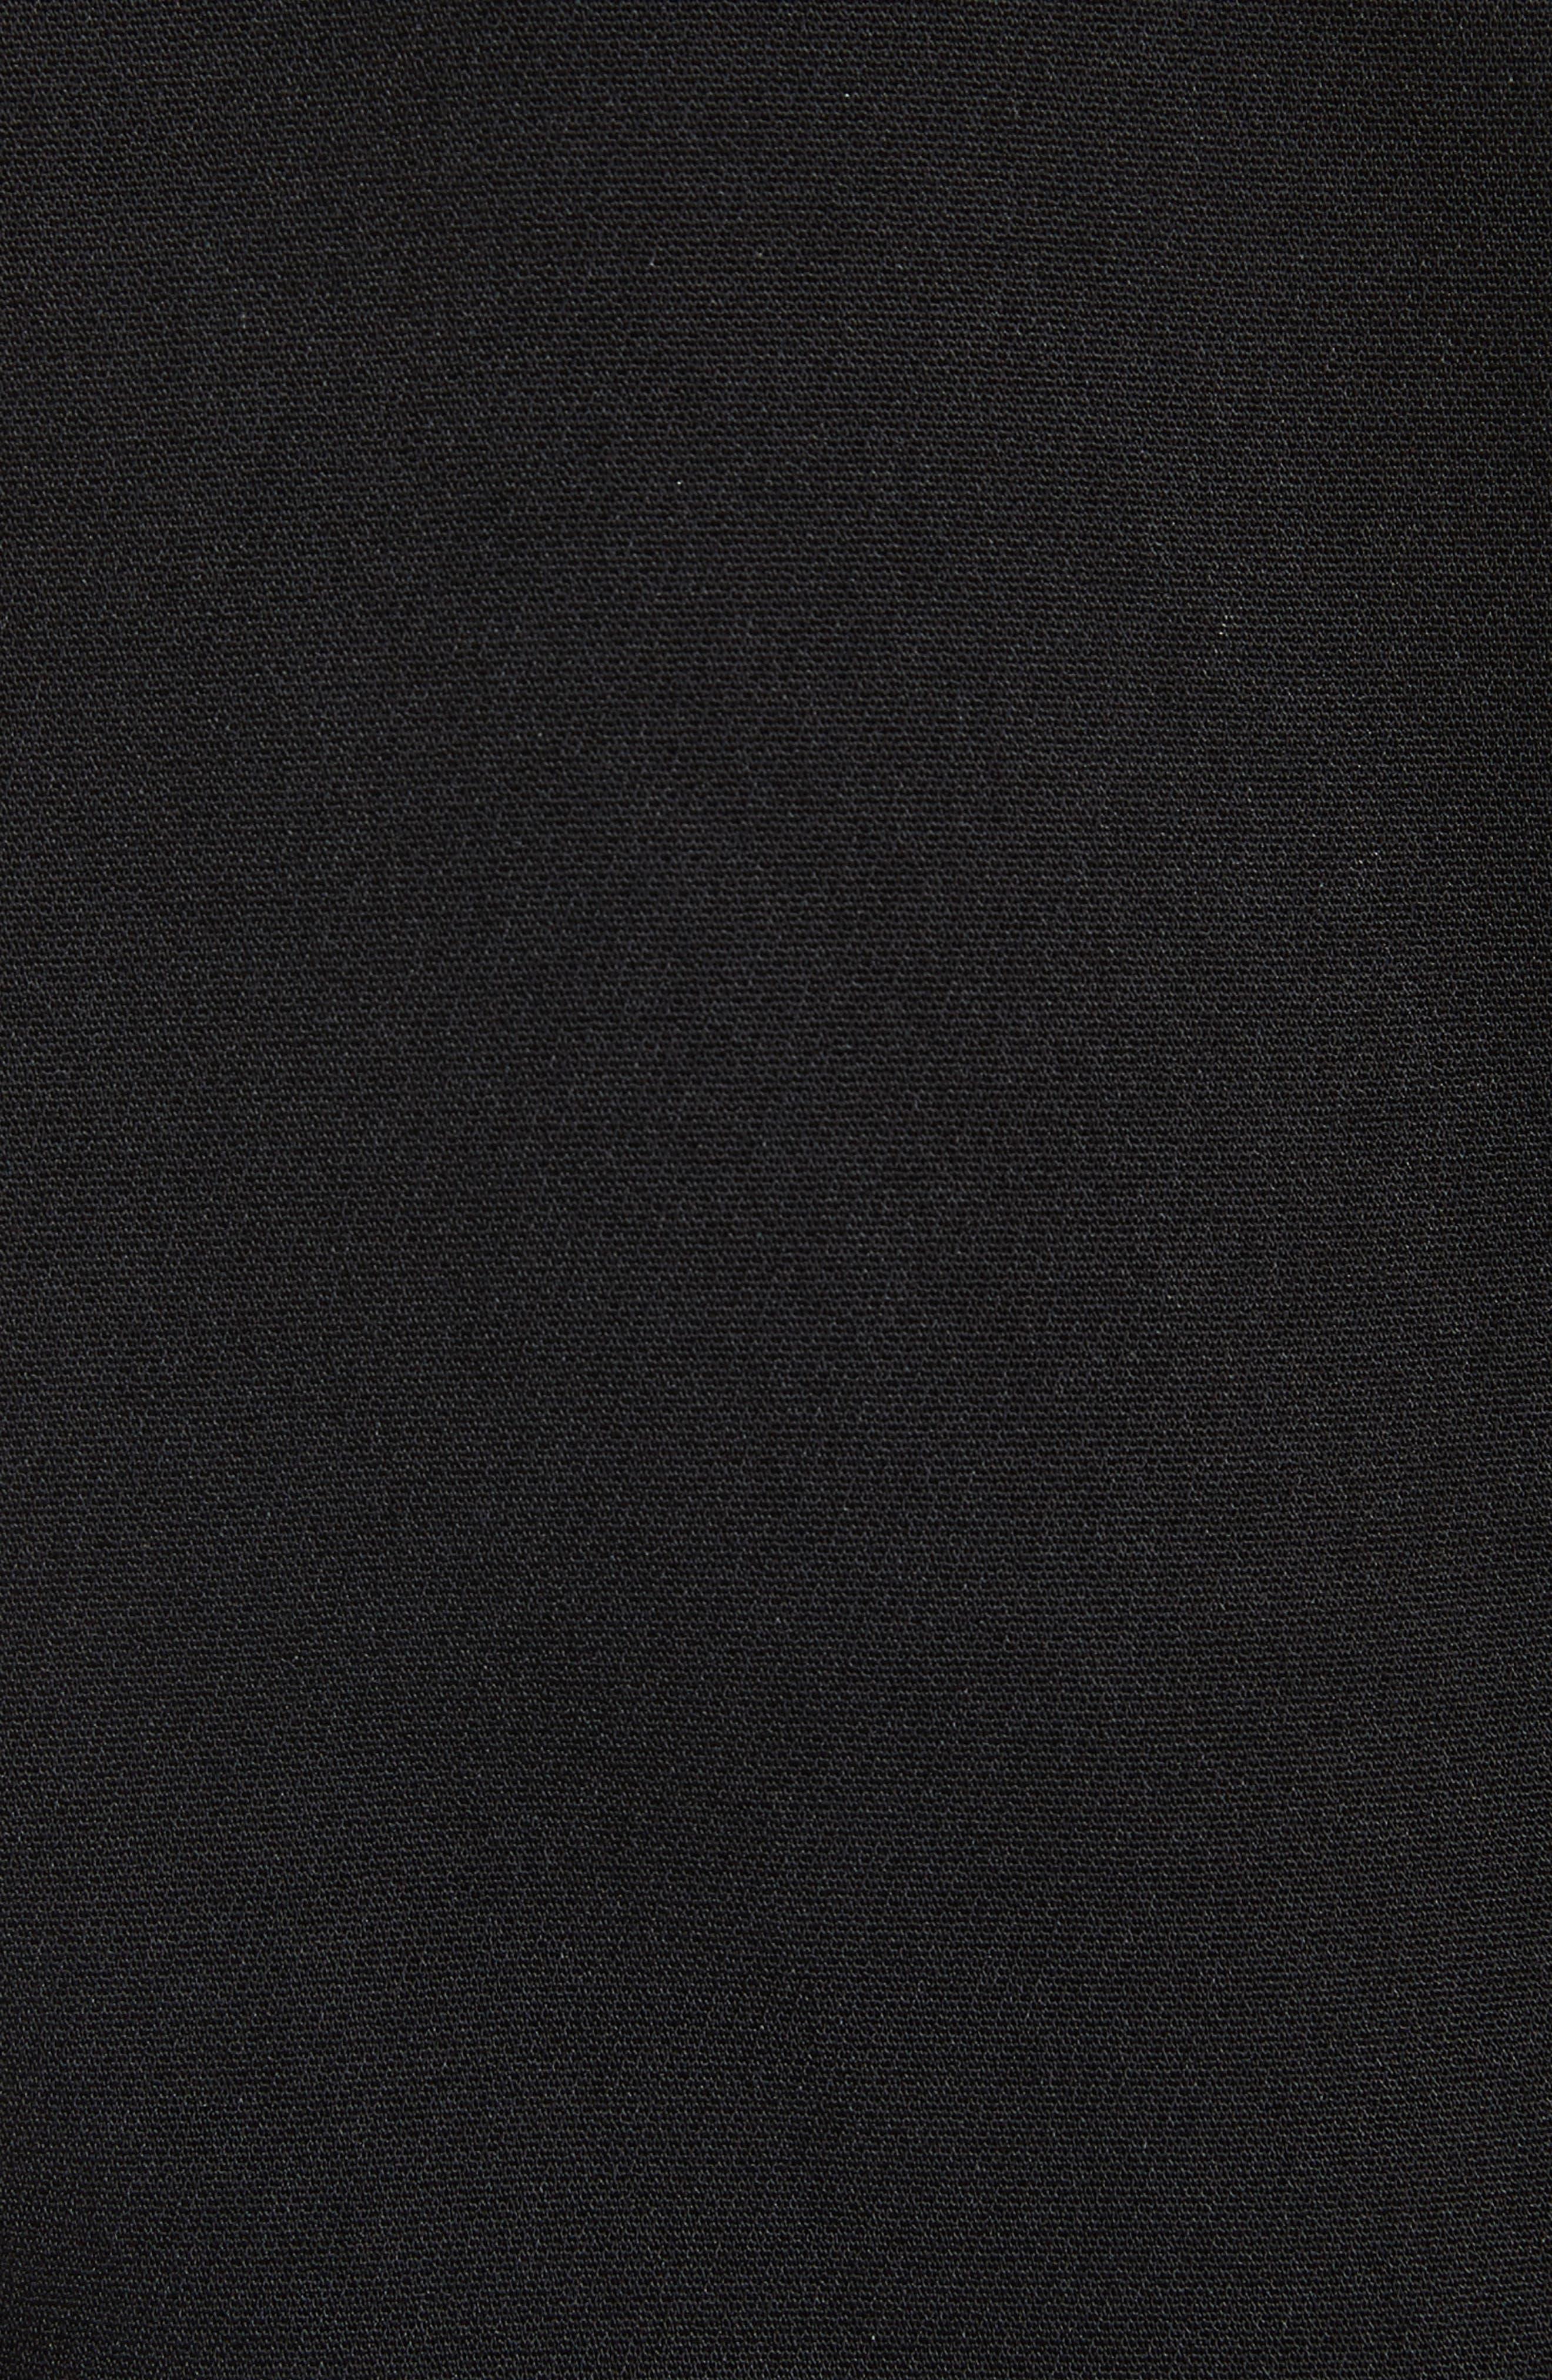 Artiro Asymmetrical Shift Dress,                             Alternate thumbnail 5, color,                             Black